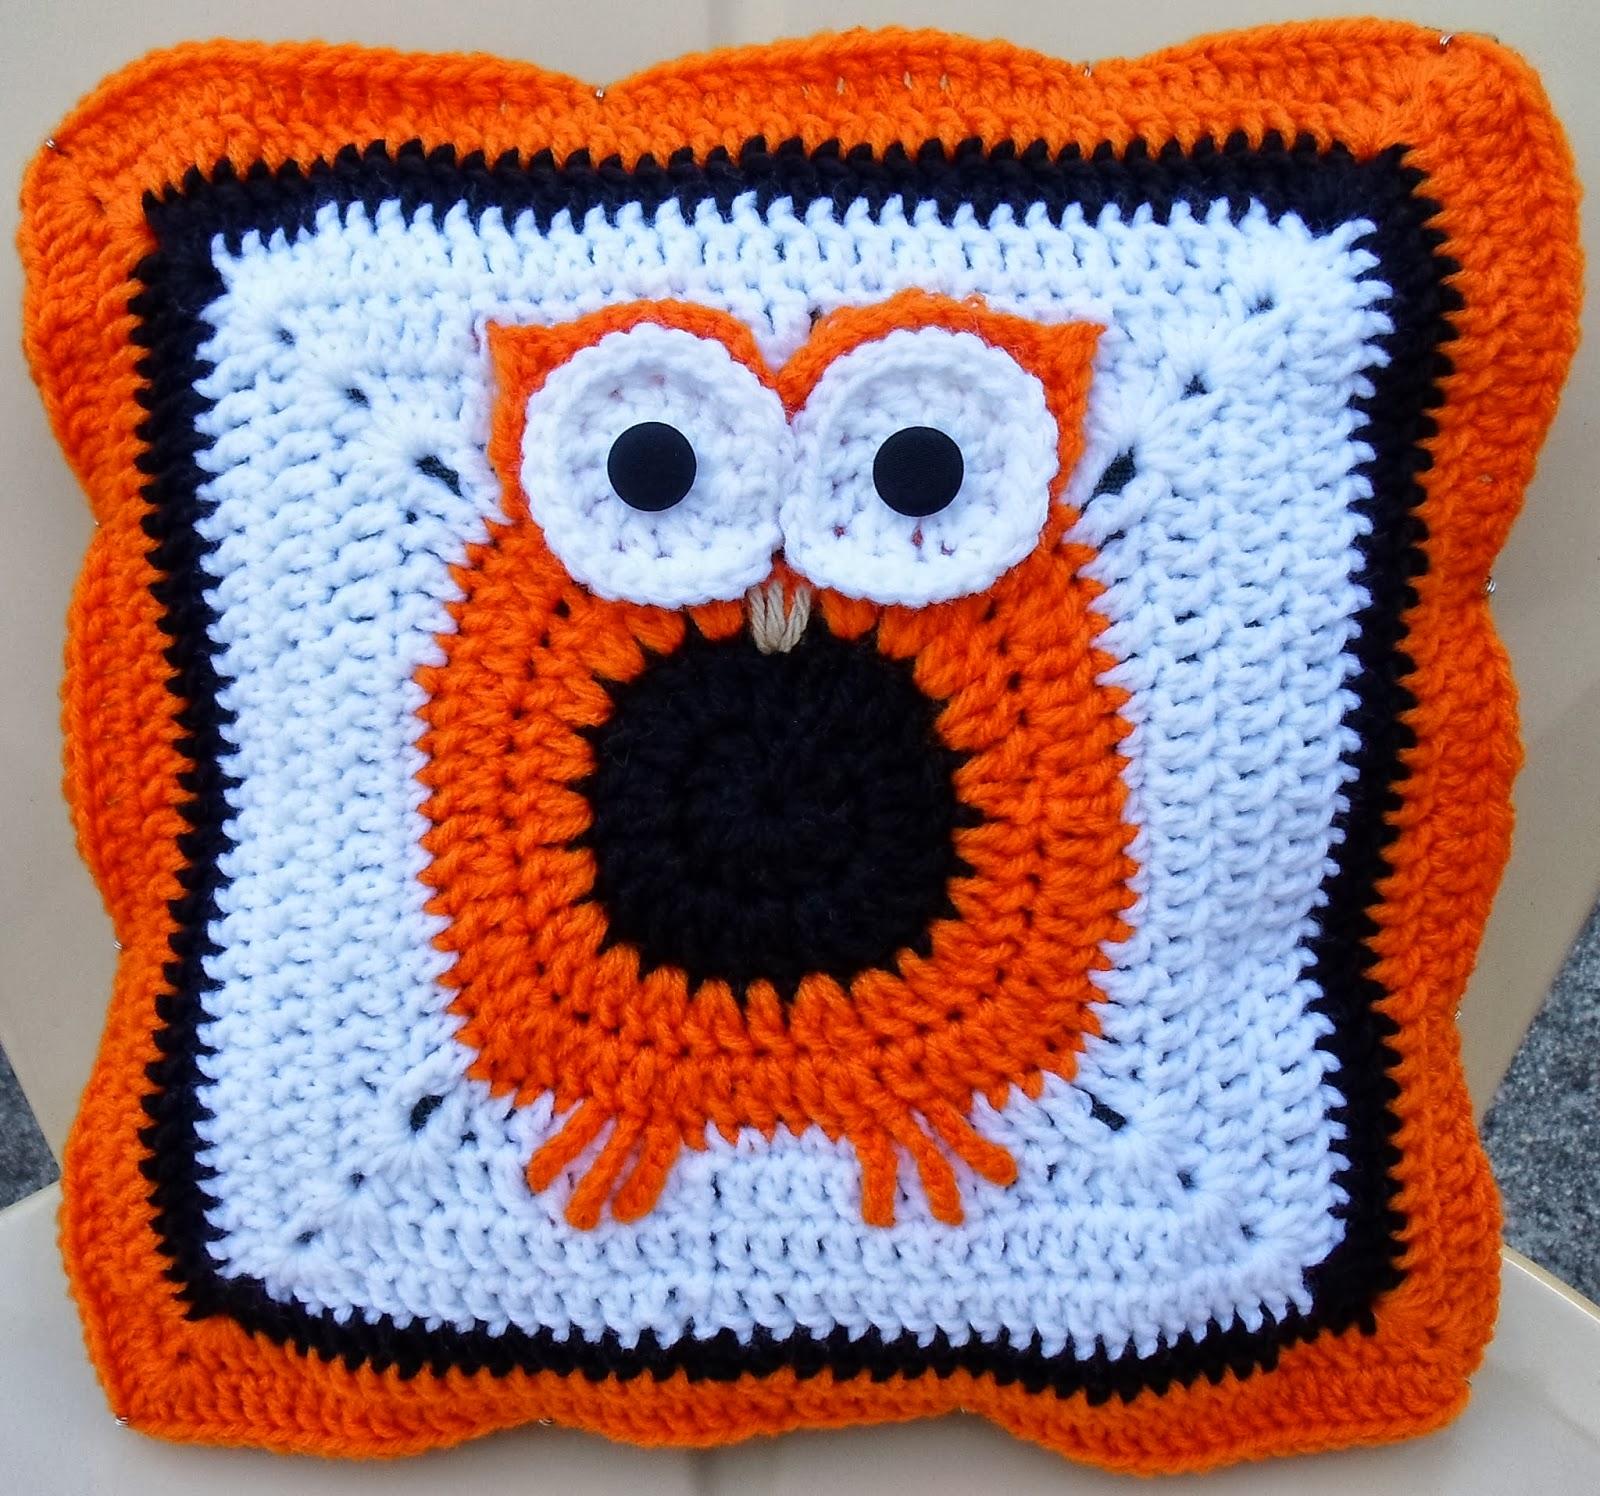 Free Crochet Pattern For Owl Pillow : Happier Than A Pig In Mud: Crochet Owl Pillow Cover Pattern